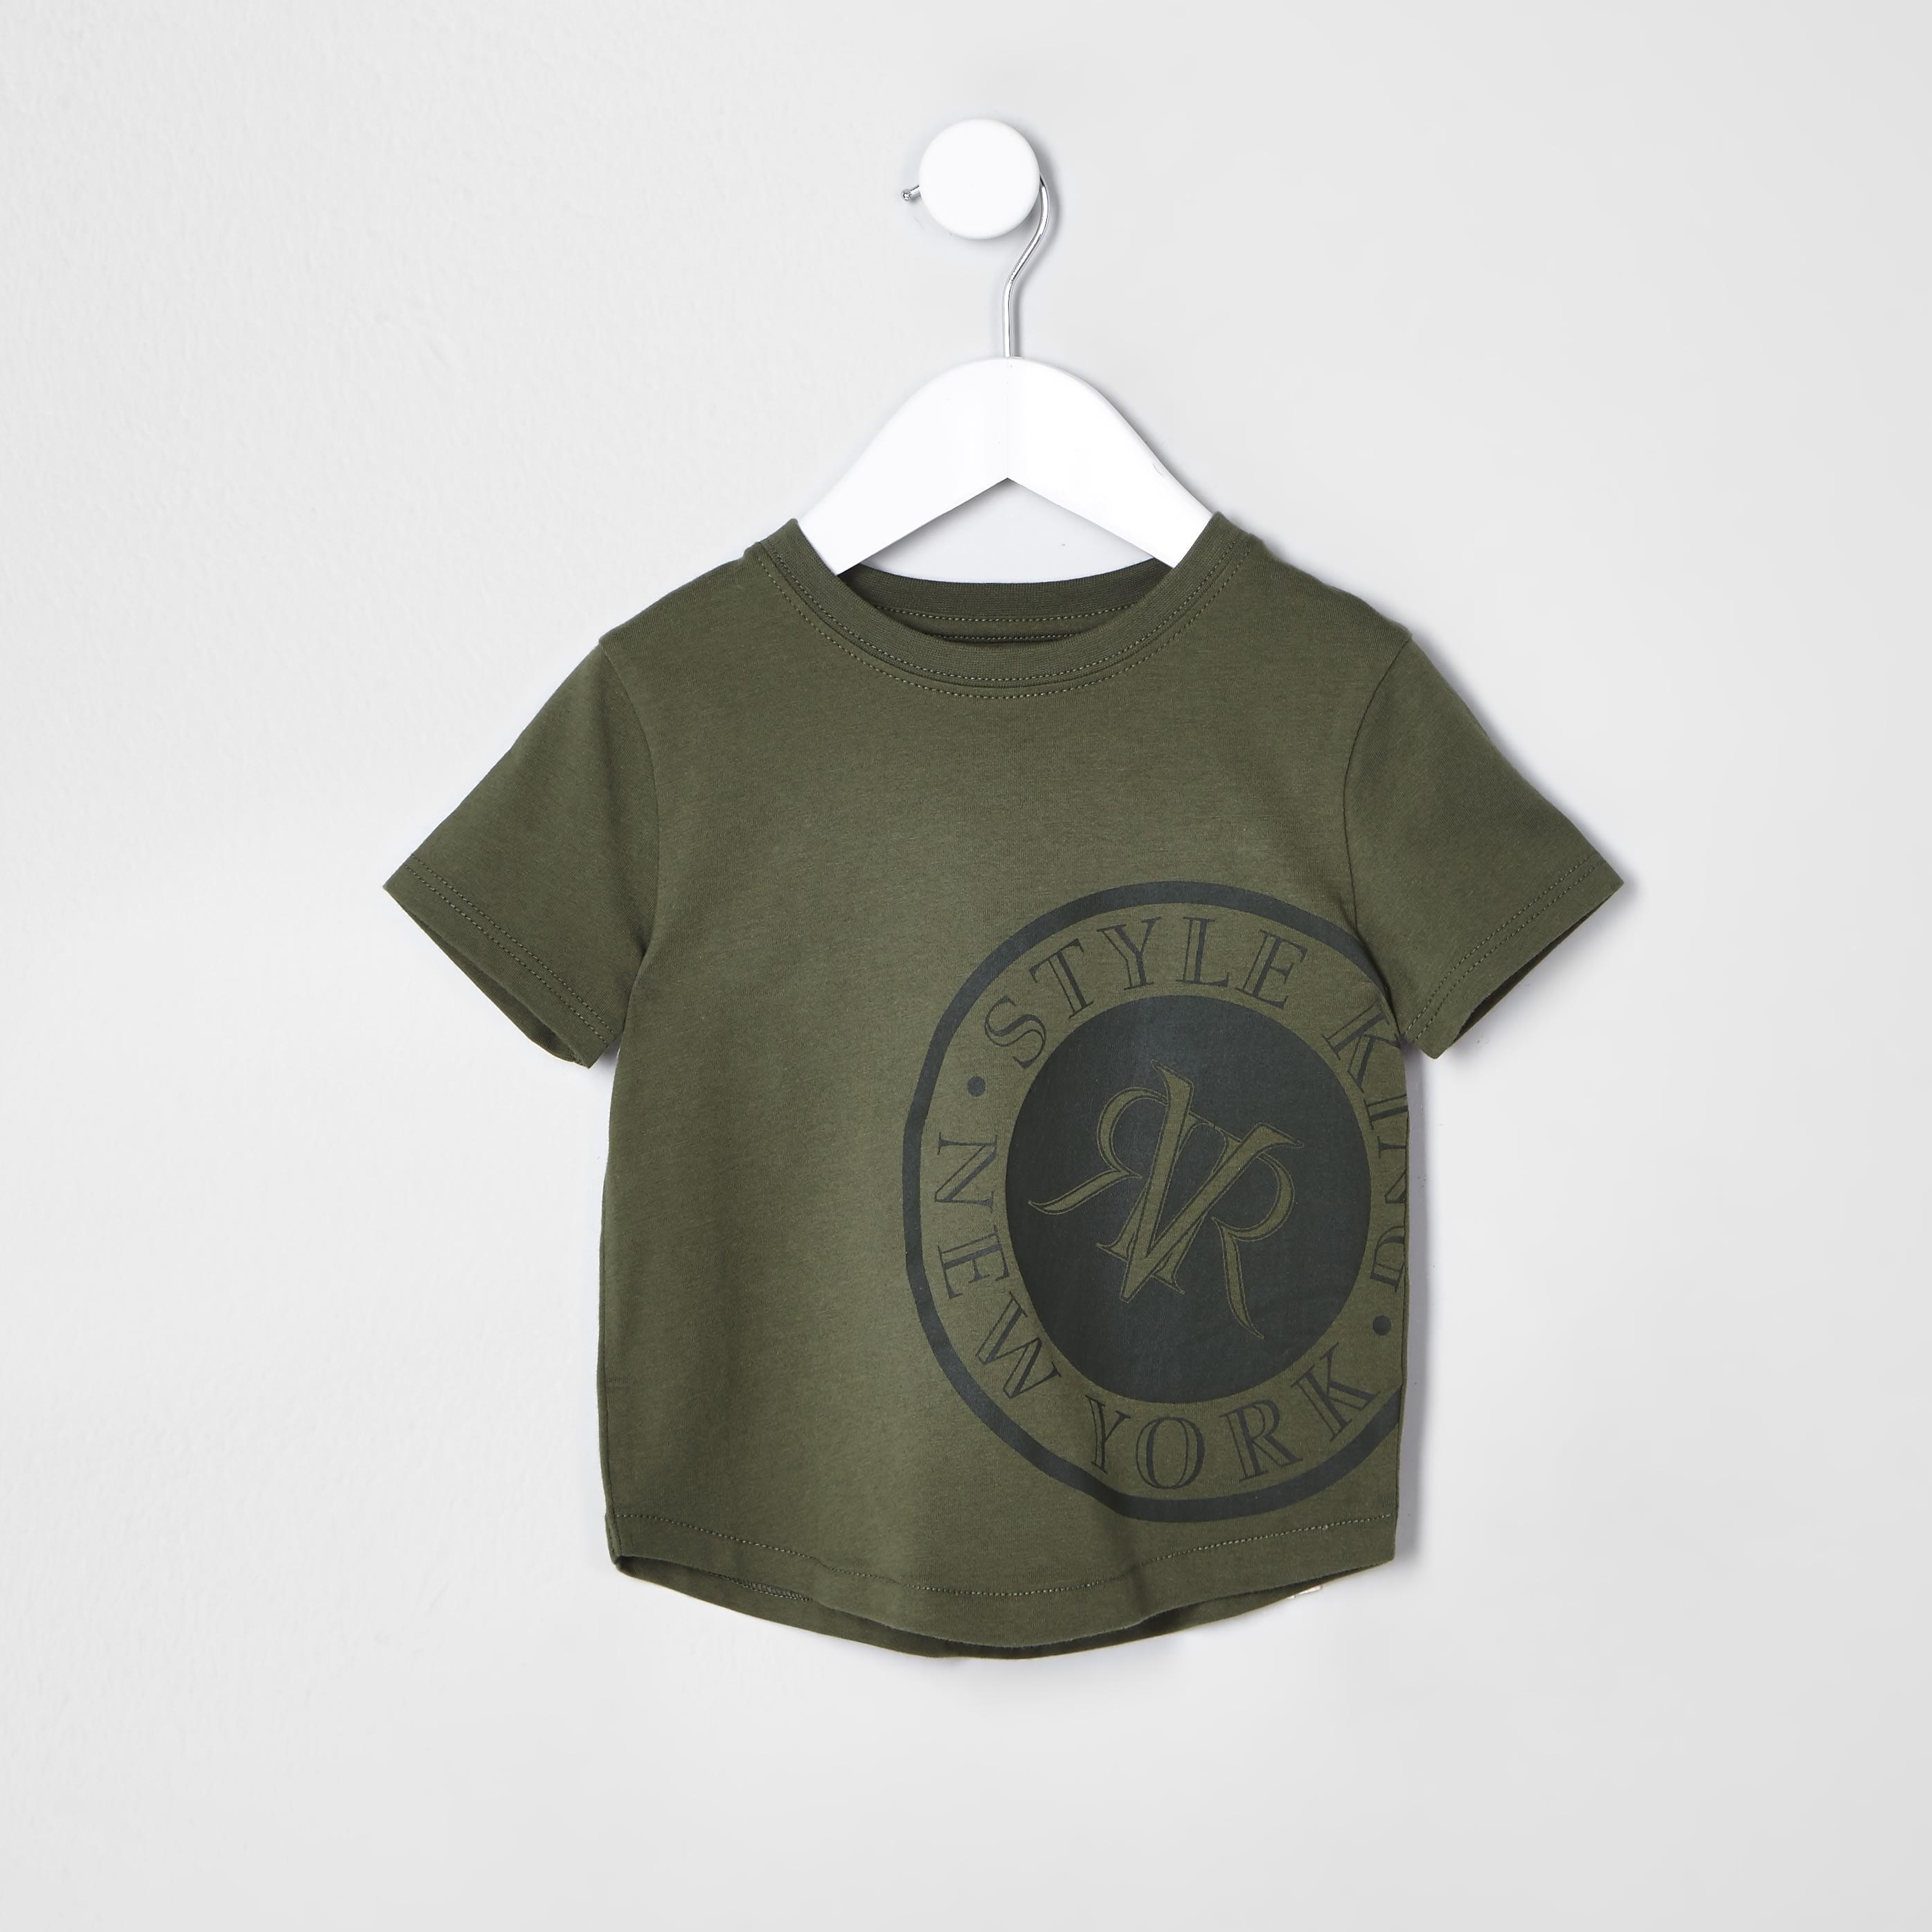 River Island Mens Baby Boys Khaki 'New York' T-shirt (6-9 Mths)